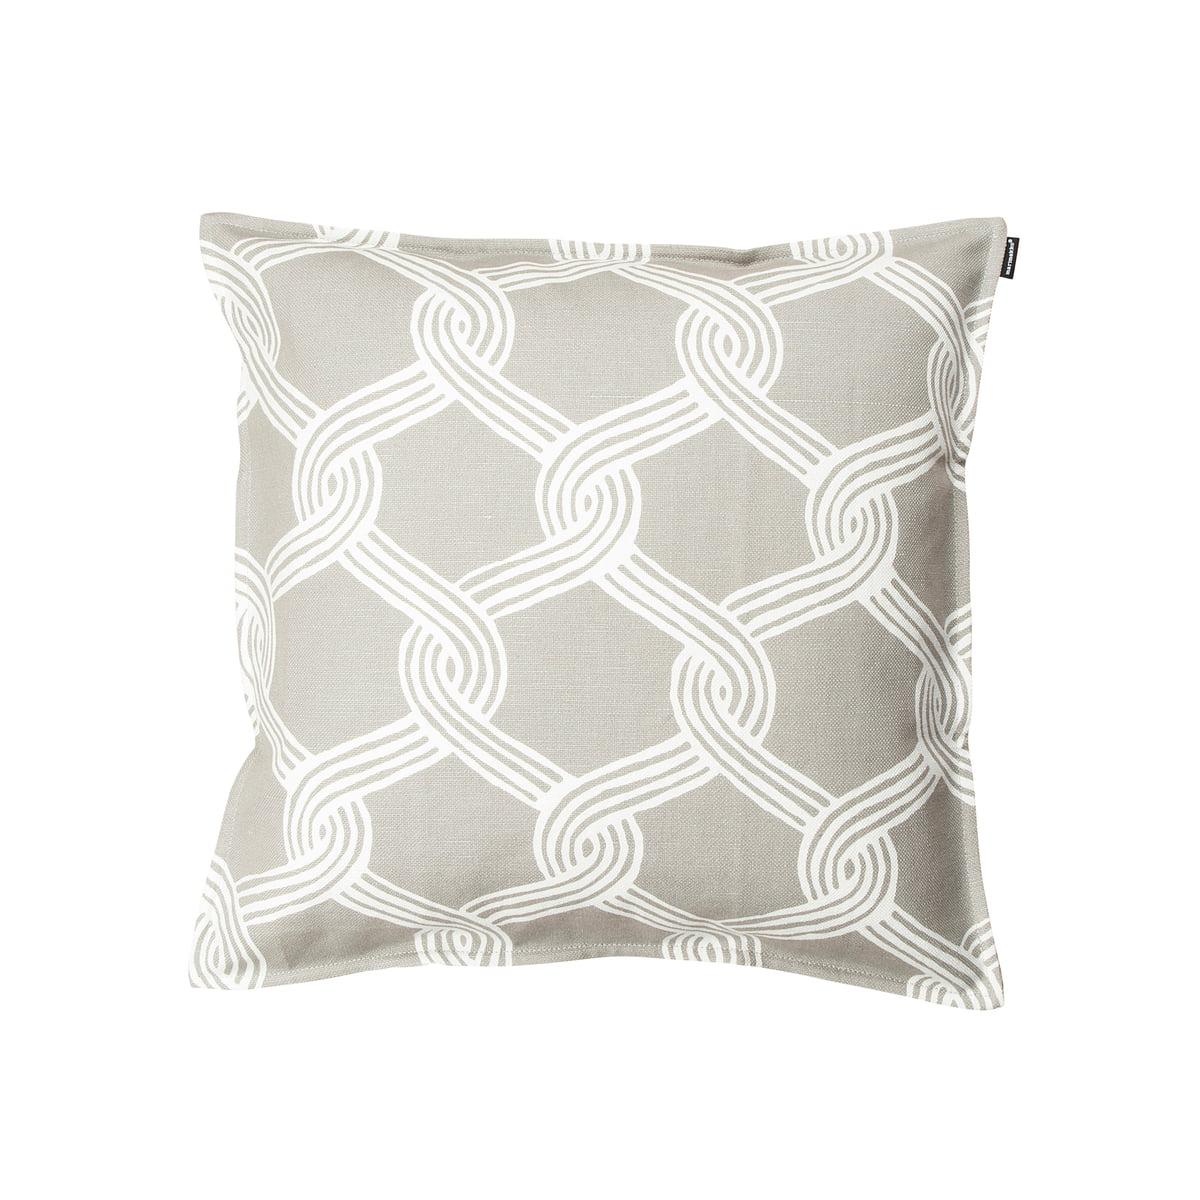 sulhasmies kissenbezug von marimekko bei. Black Bedroom Furniture Sets. Home Design Ideas